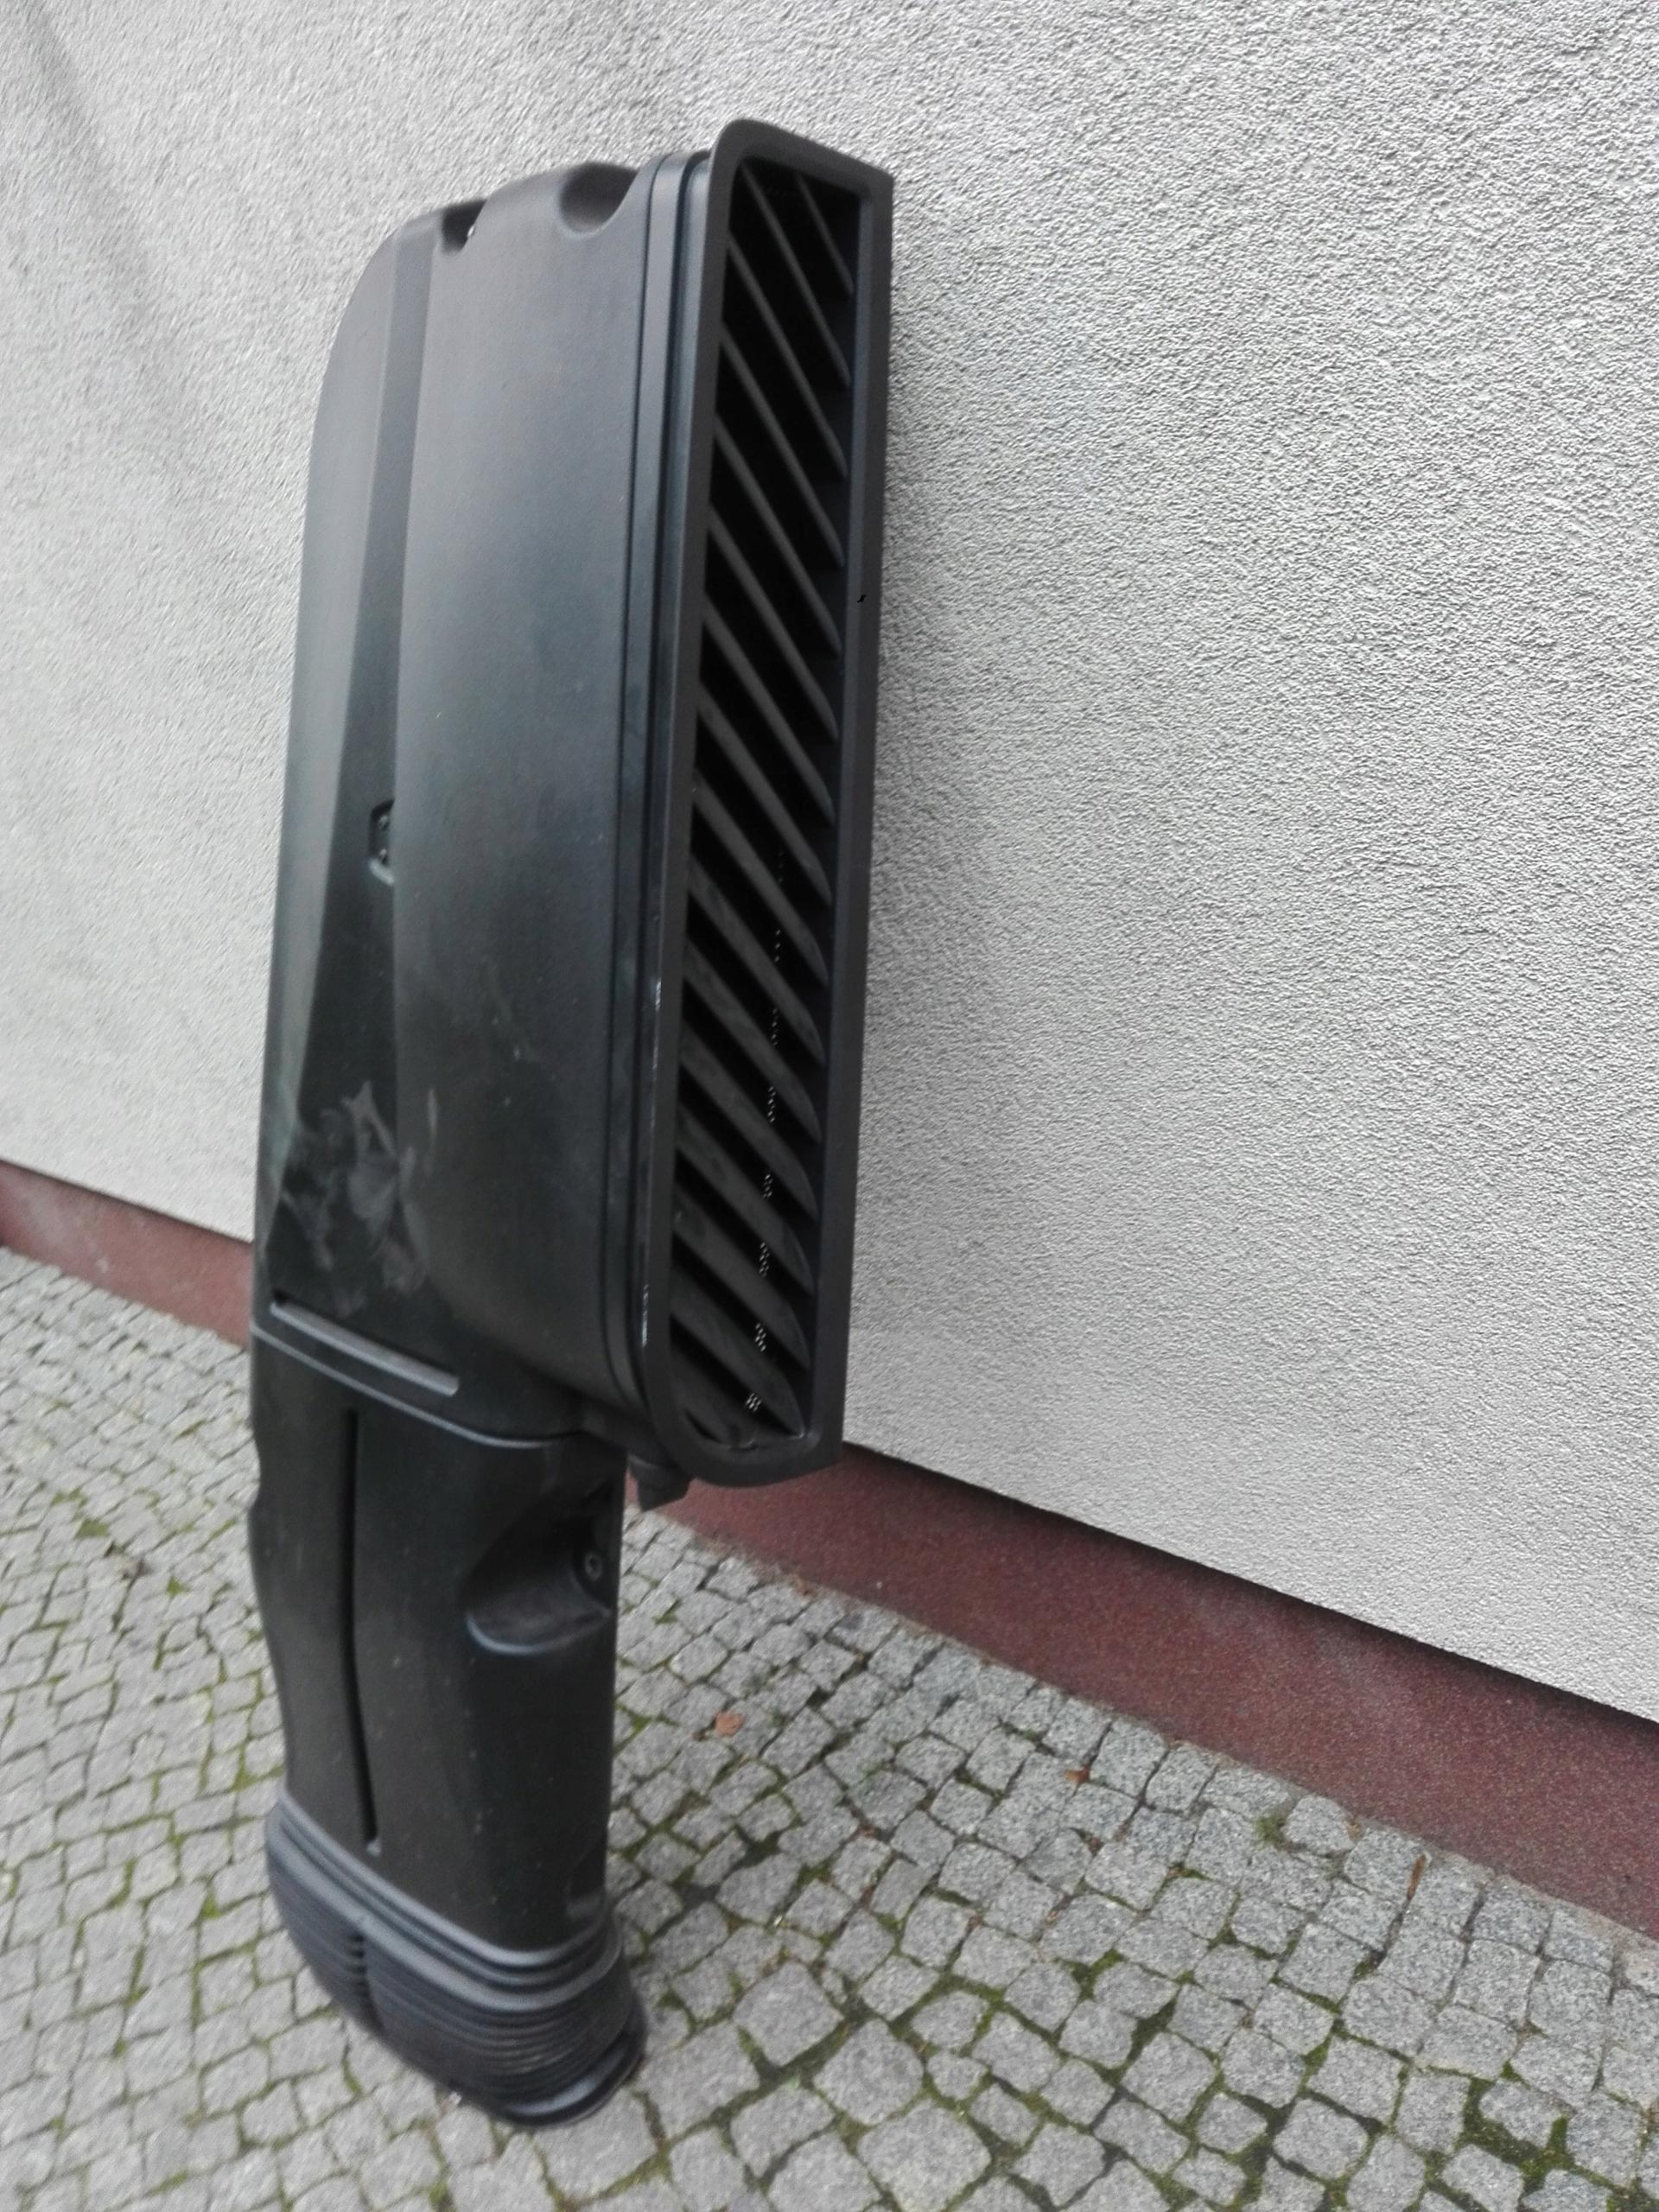 daf xf 106 дымоход на входе воздуха 800 злотых чистая